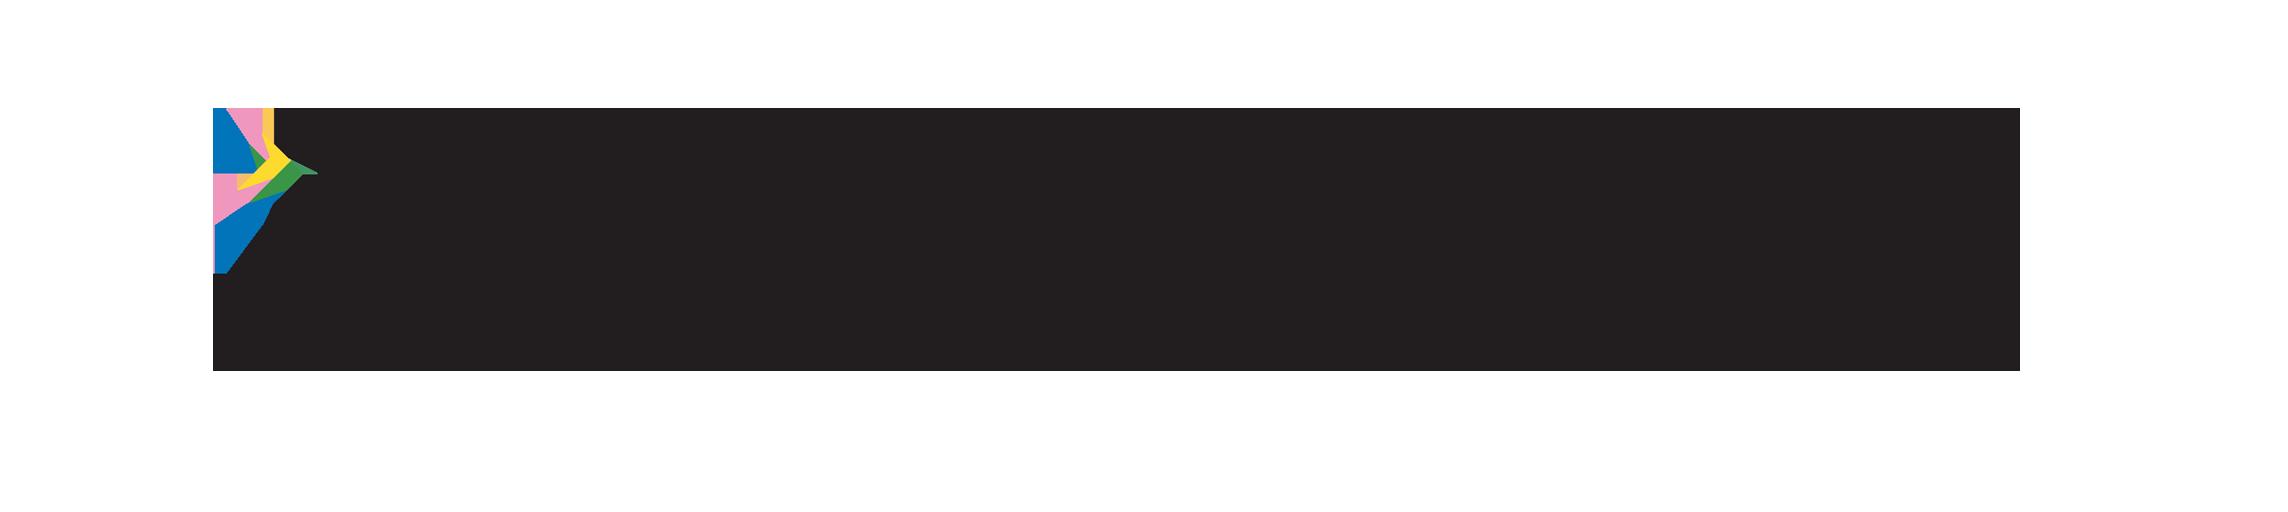 Berlin Travel Festival Logo .png